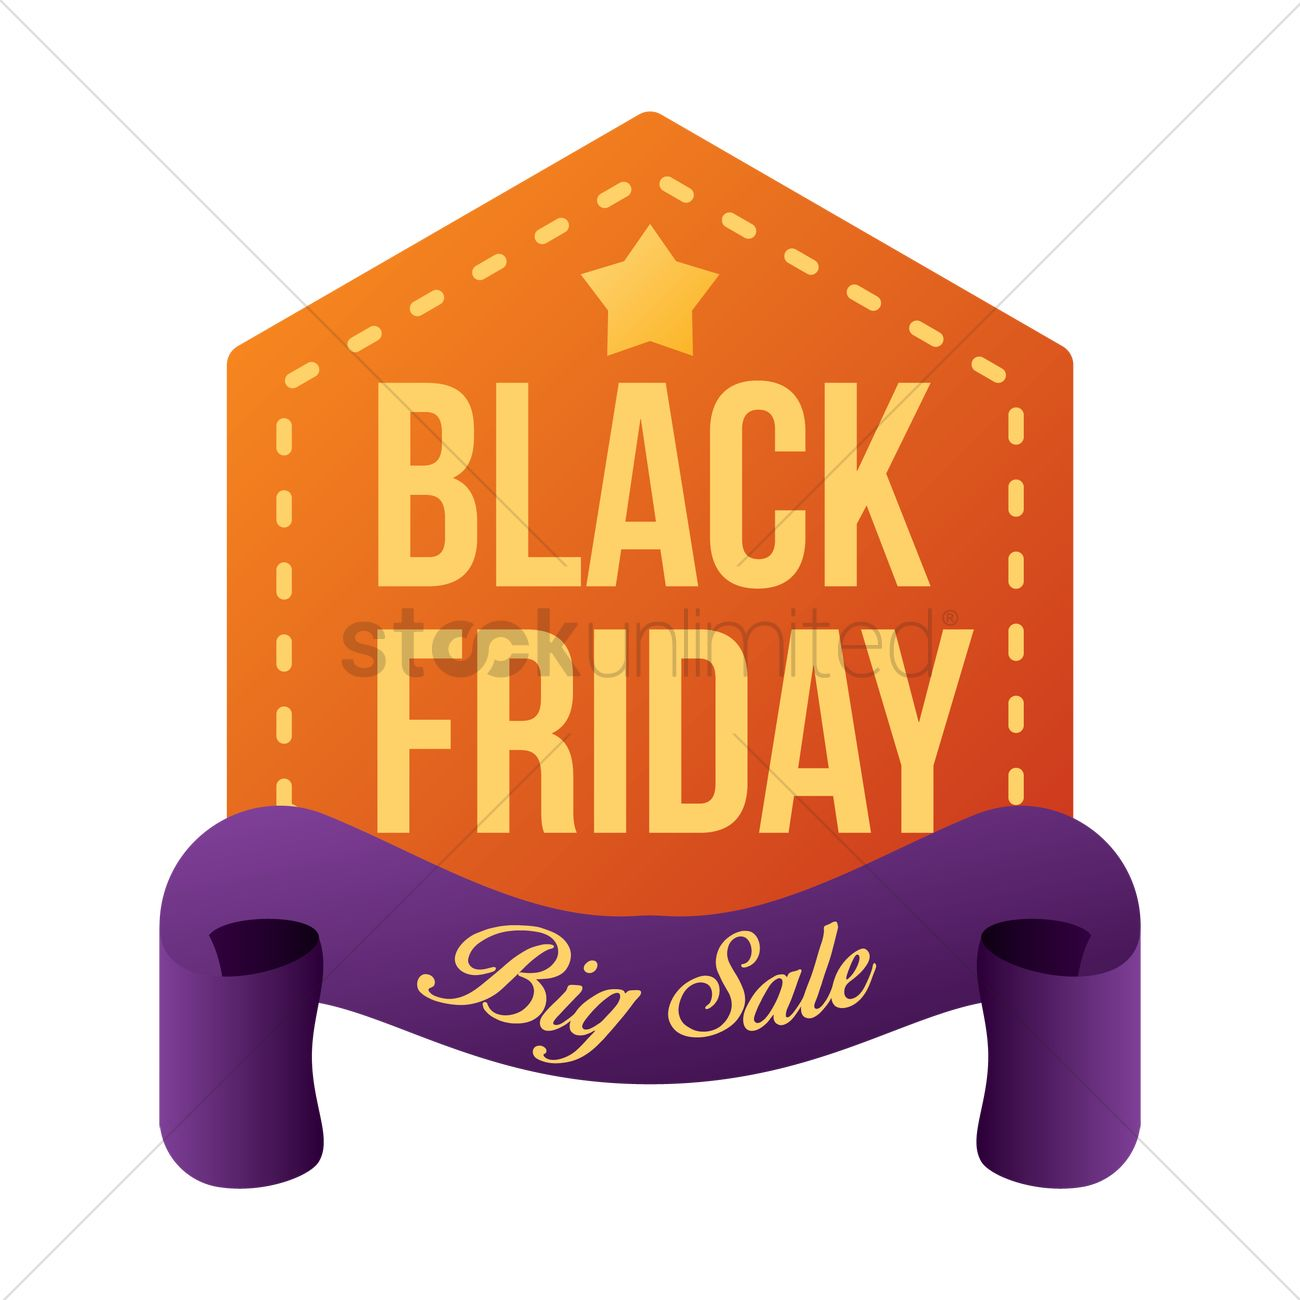 Black Friday Sale Sticker Vector Image 1819930 Stockunlimited